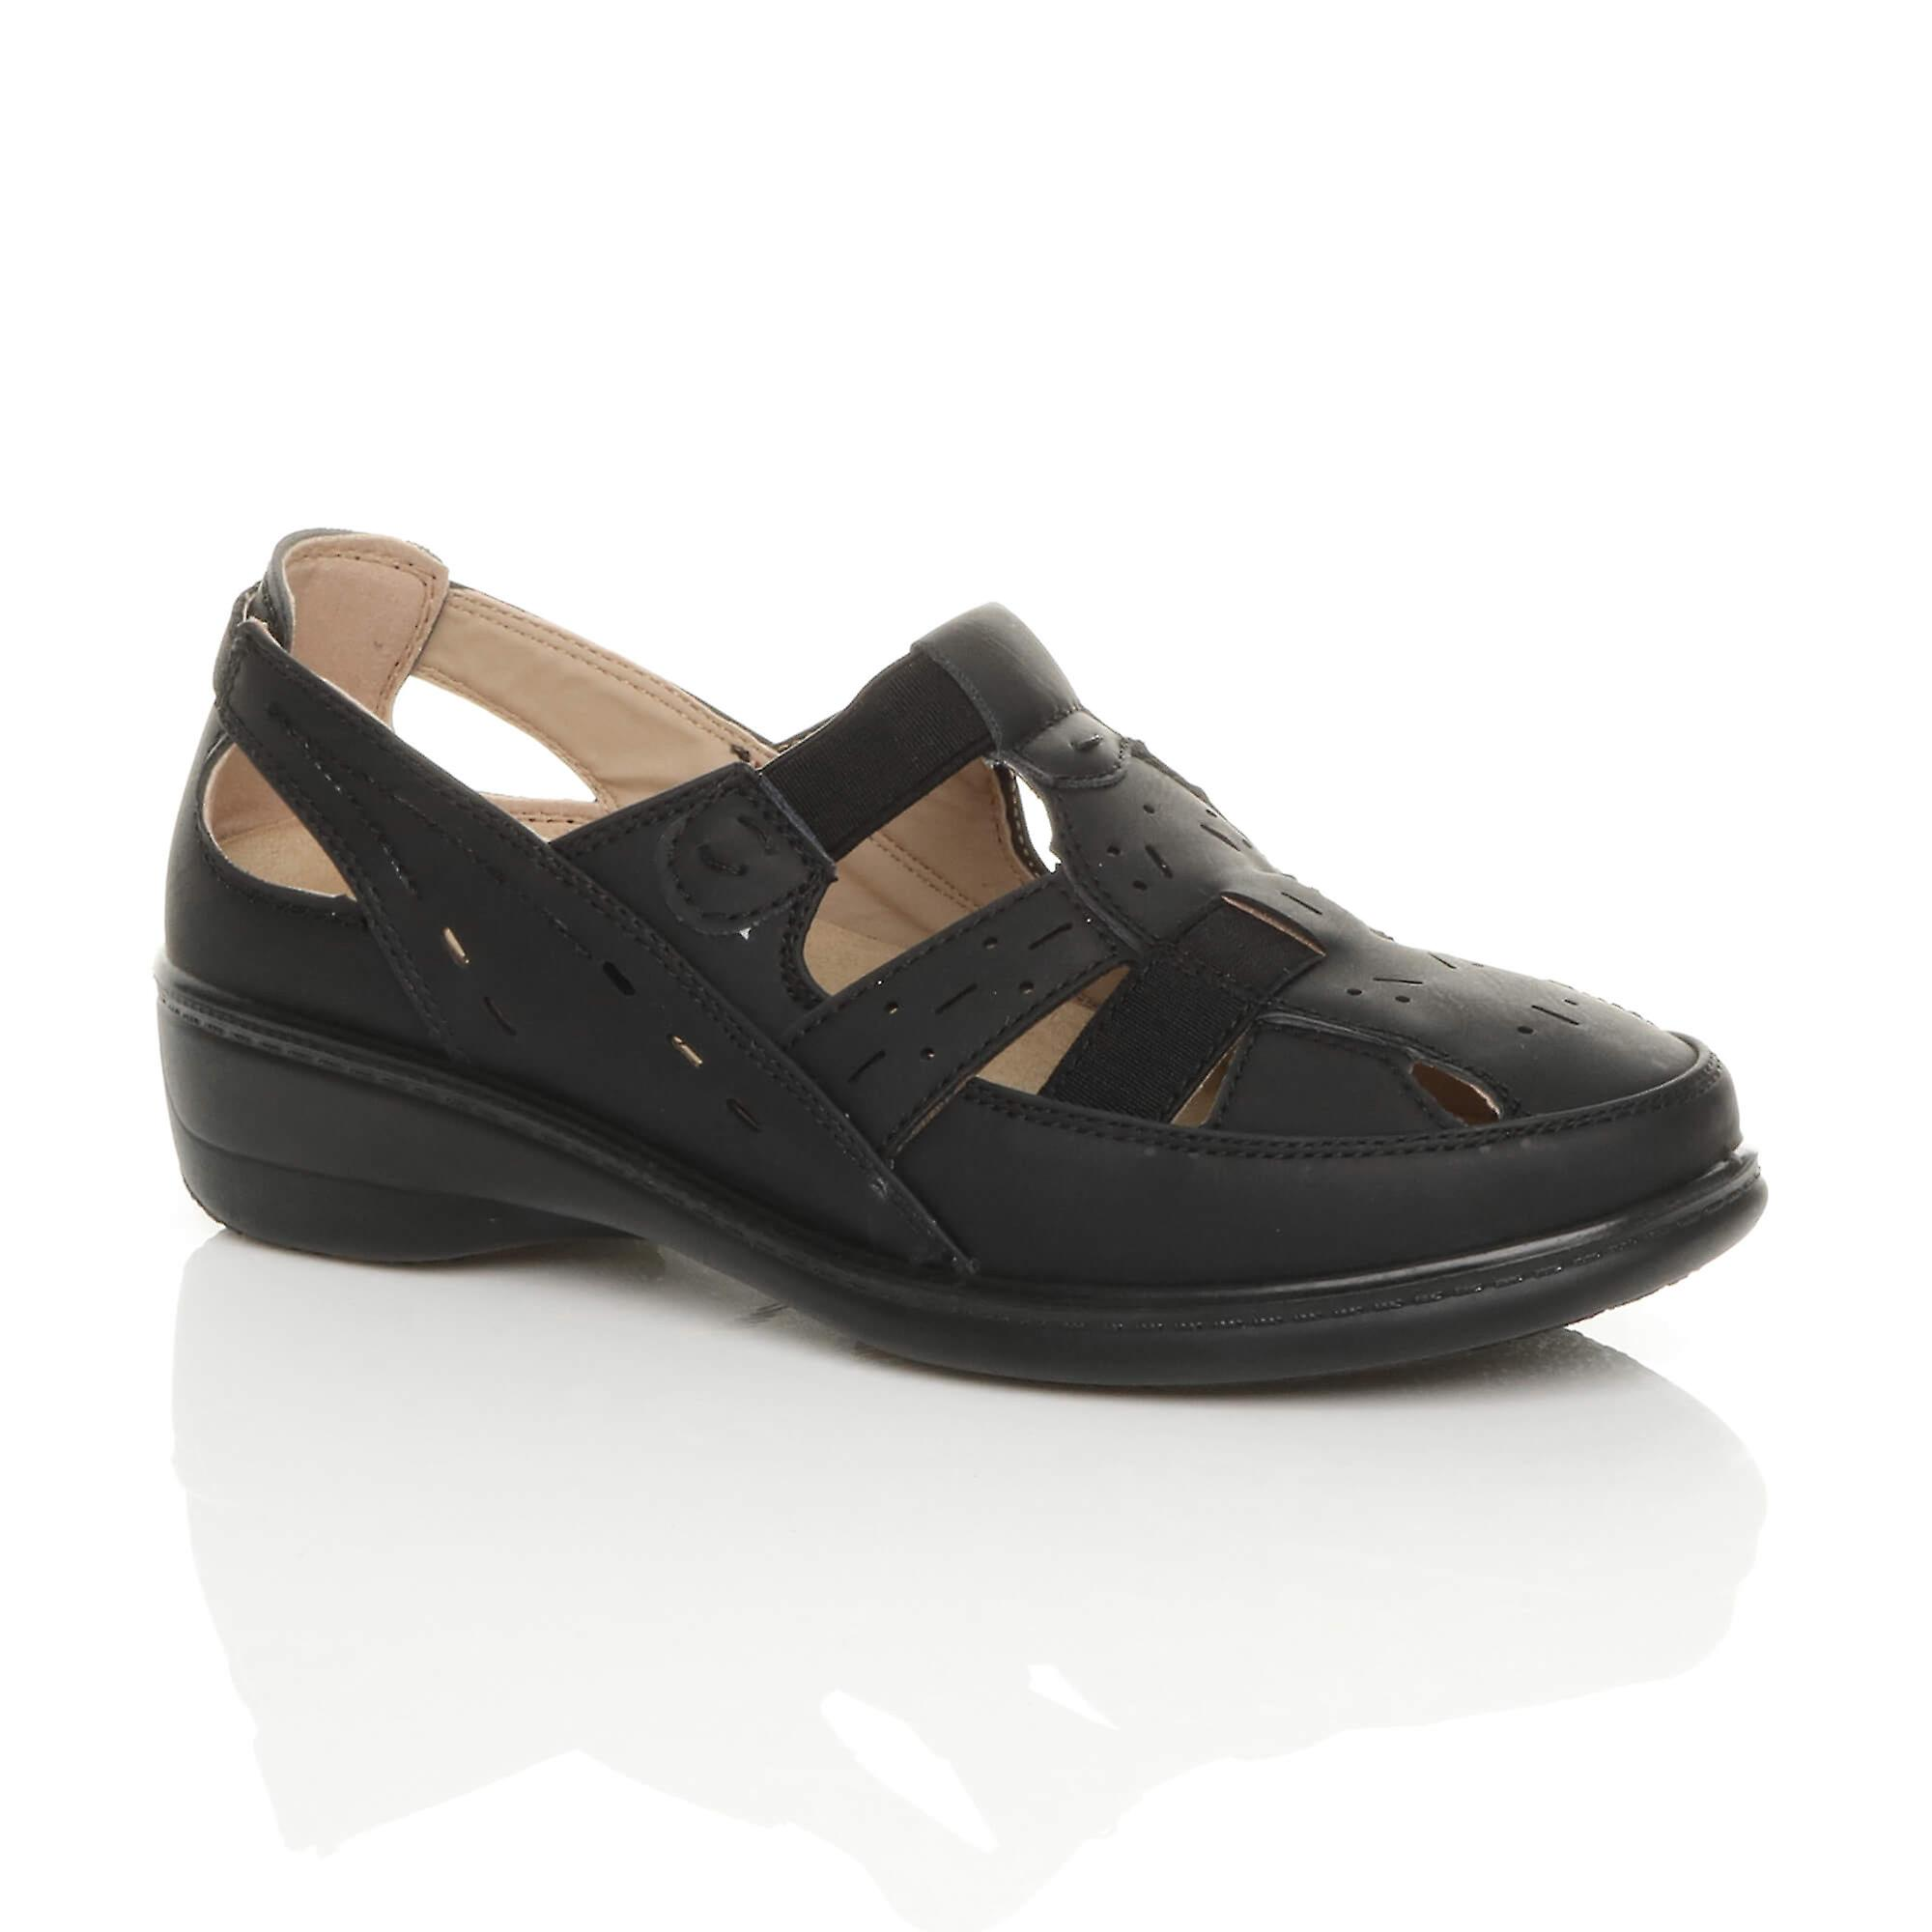 Ajvani womens low heel lightweight elastic comfort casual walking shoes 7qPW2